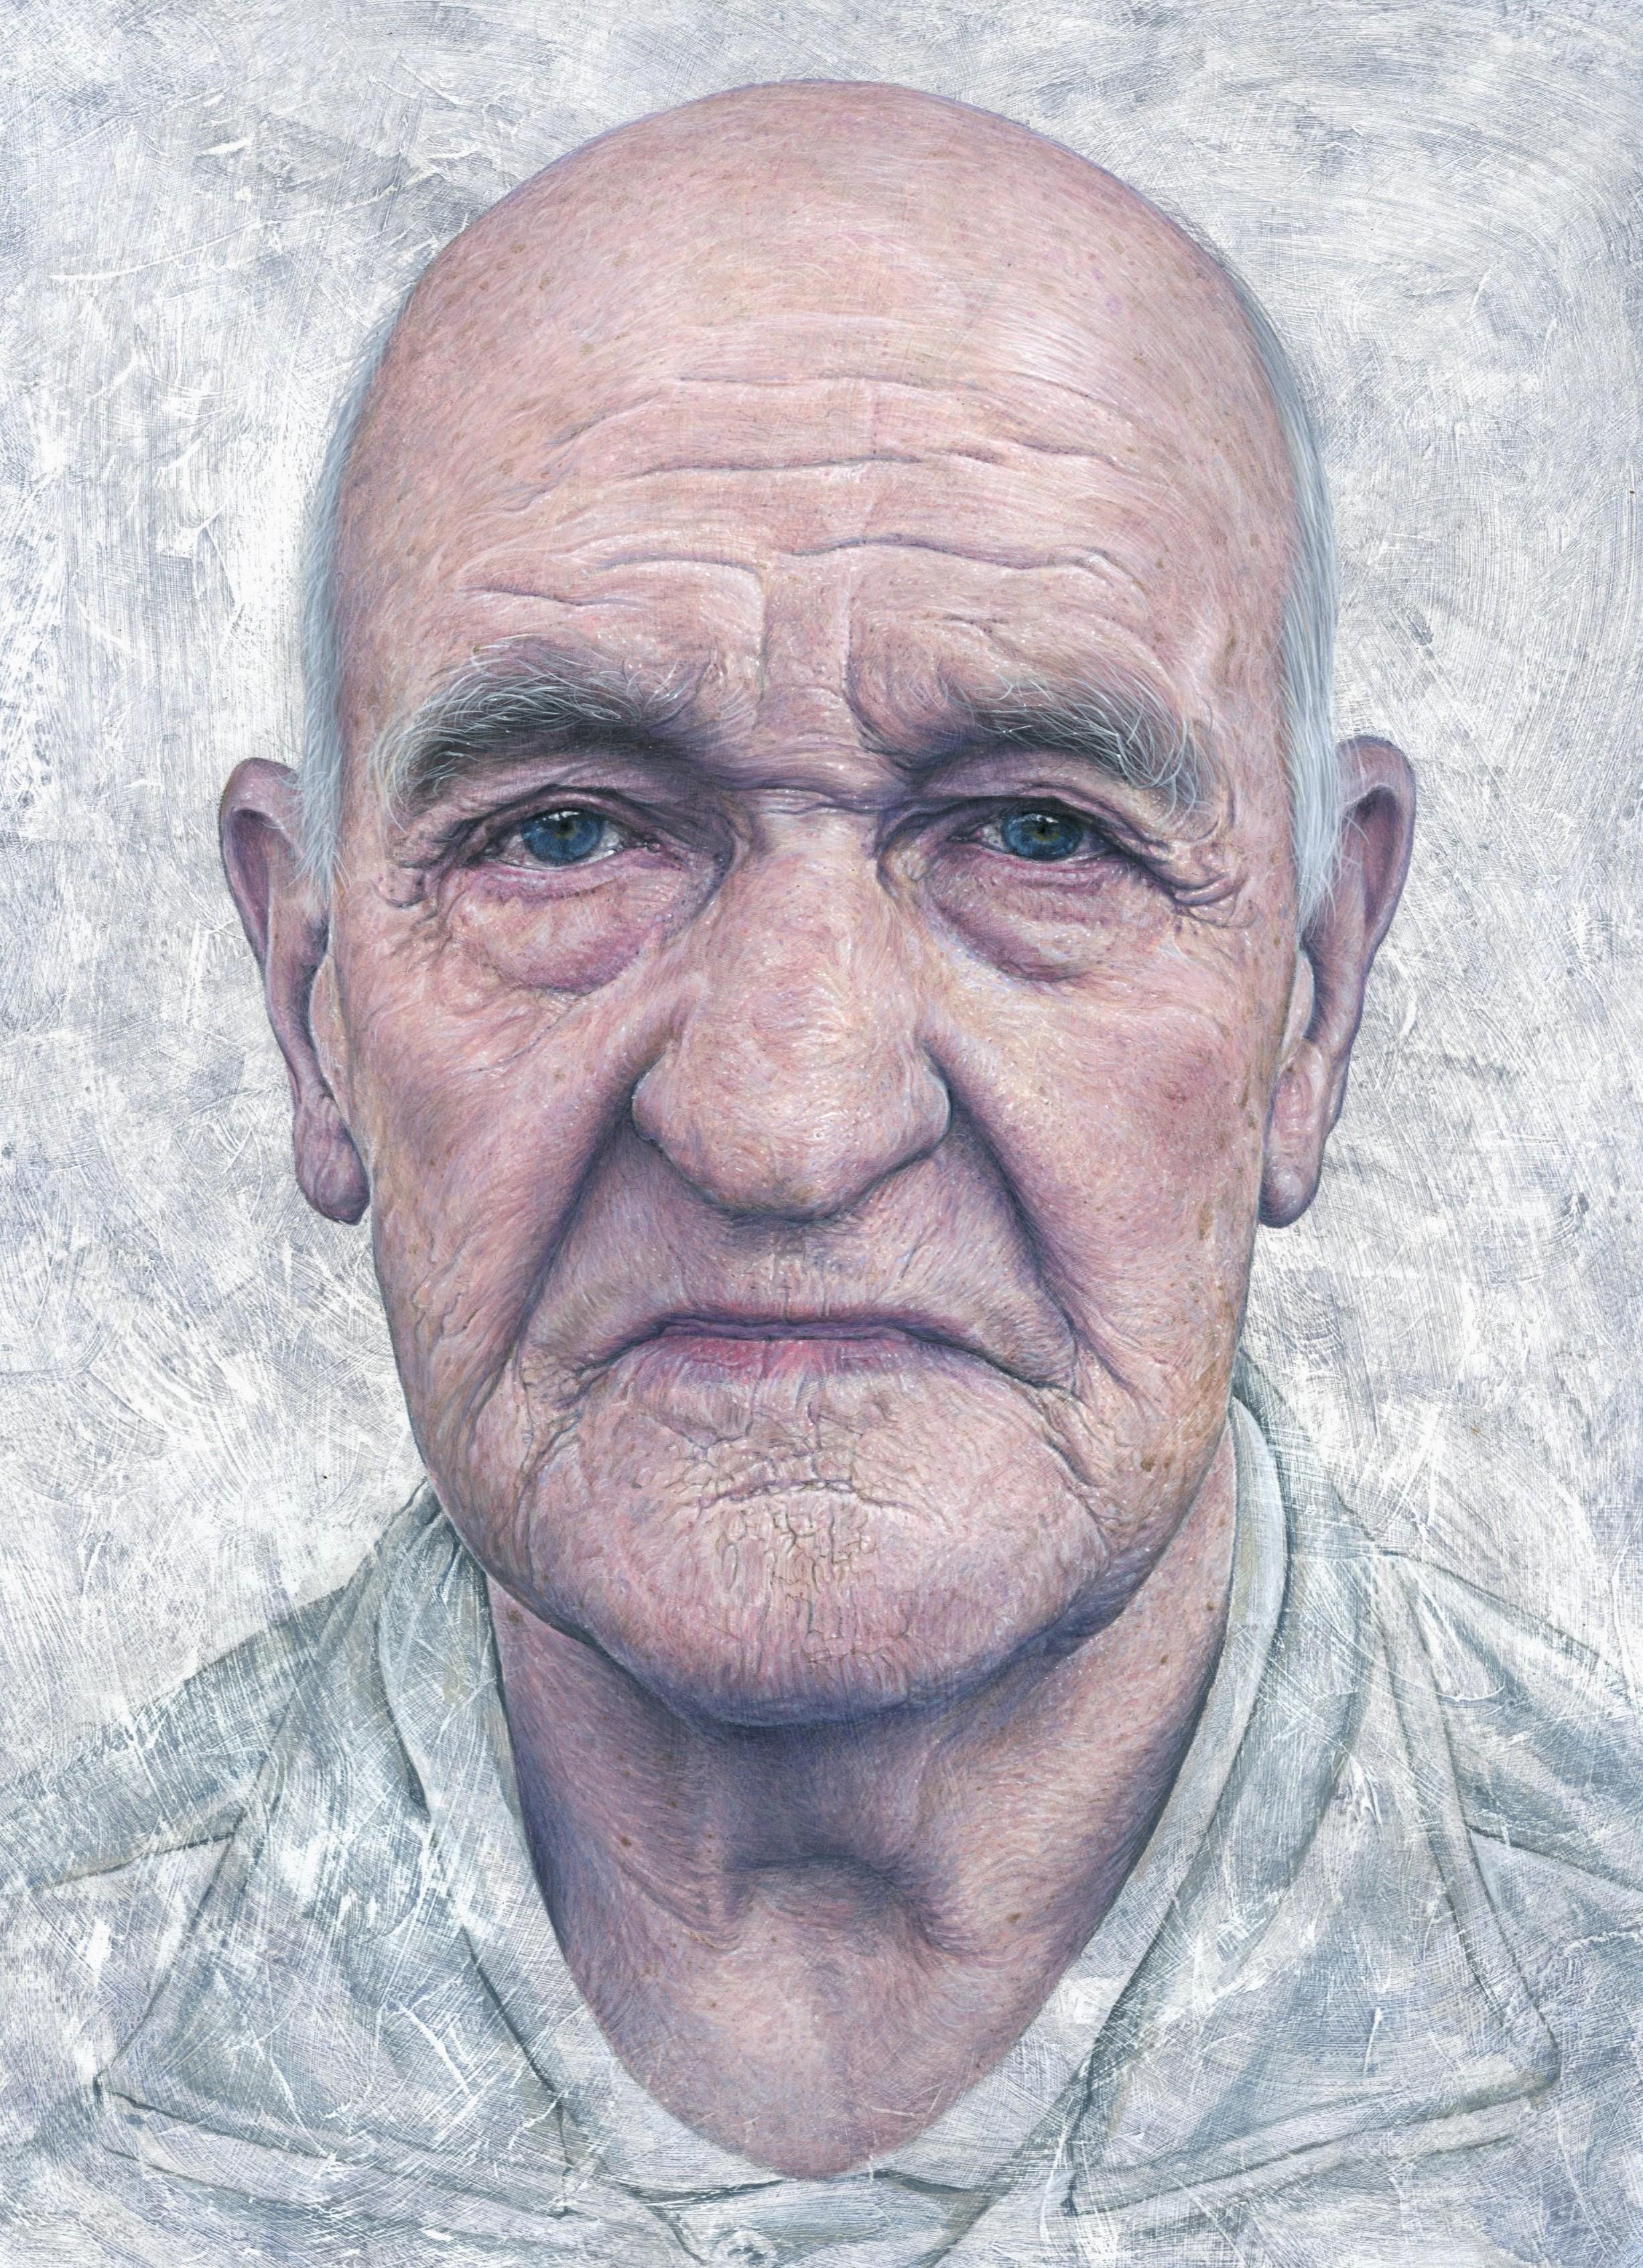 Steve Caldwelll, Bryne at 85, acrylic on wood panel., 30 x 24 cm,  http://www.steve-caldwell.co.uk